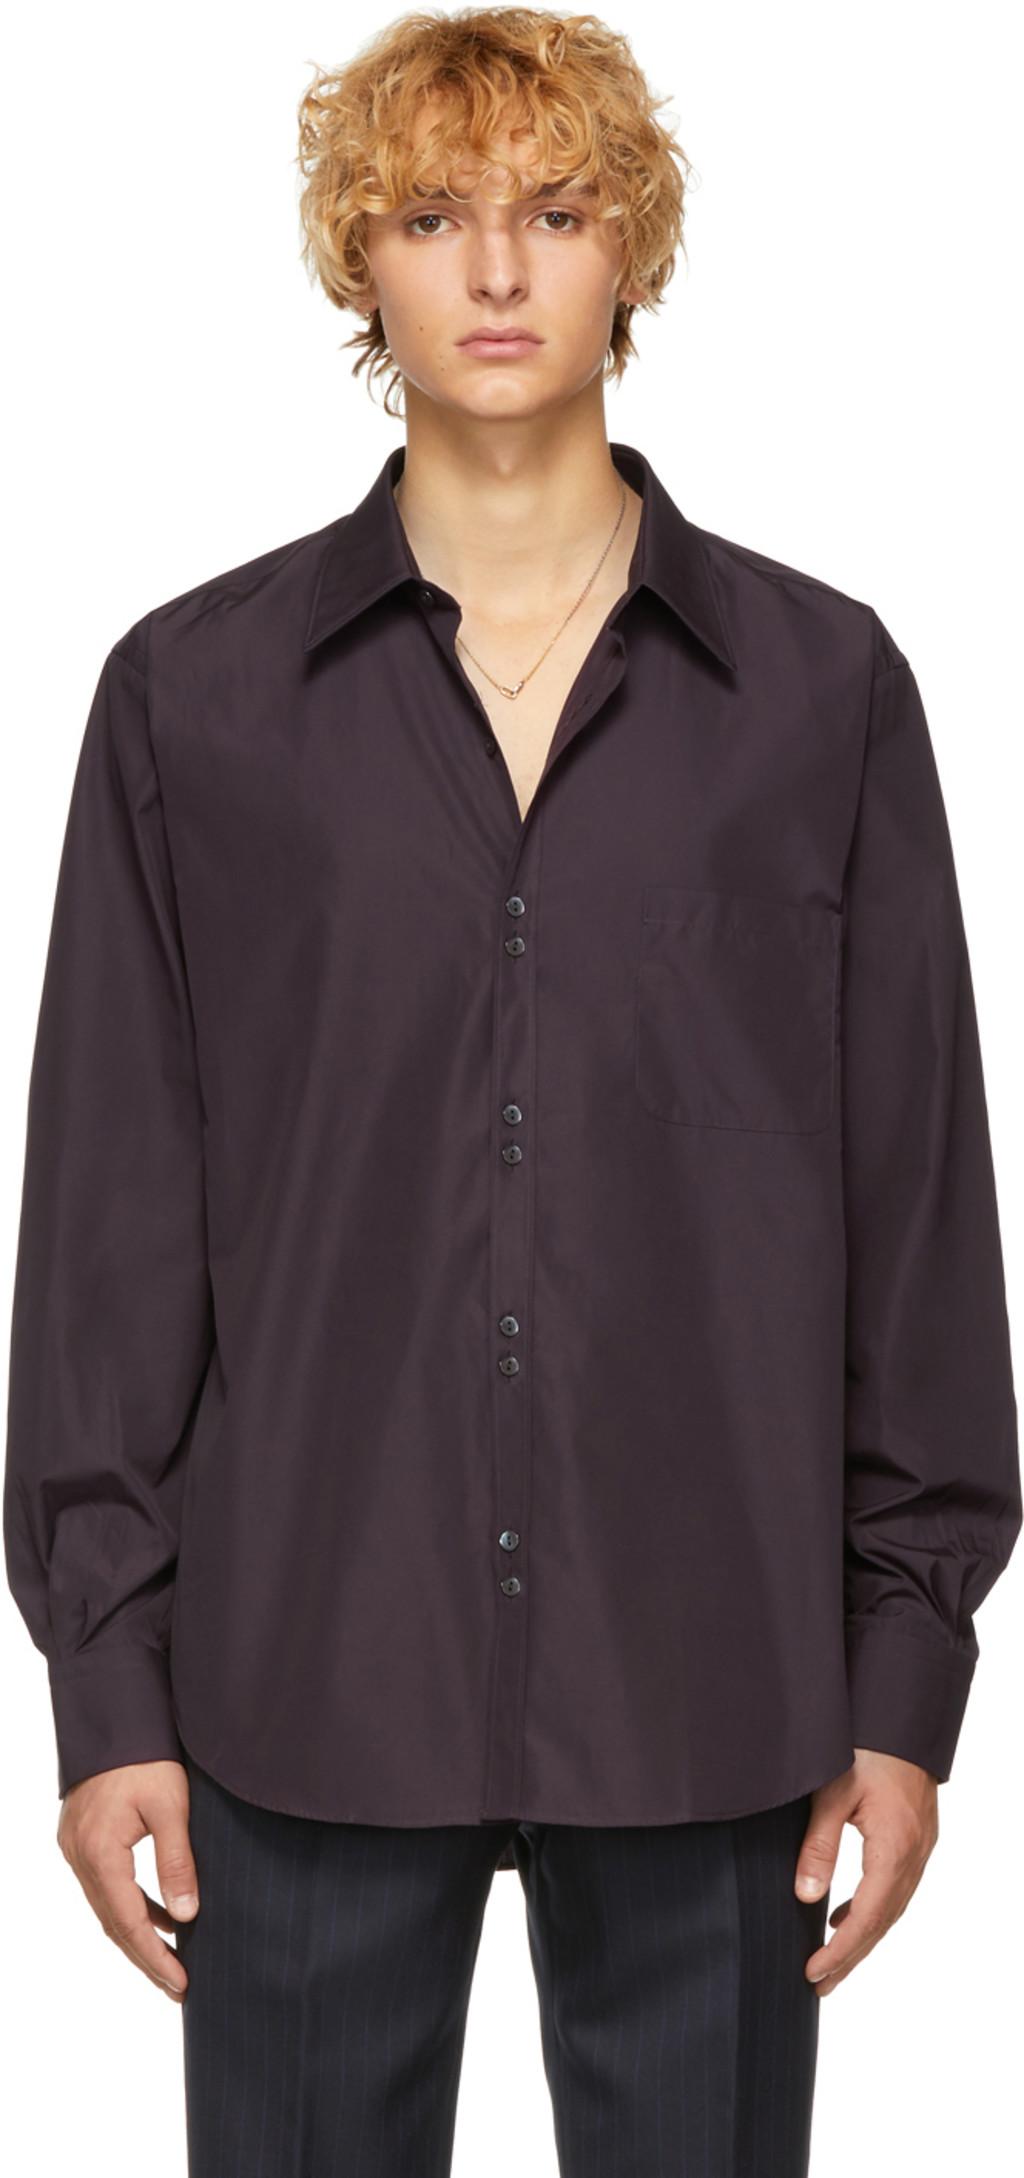 4143de5ca1d Womens Plus Size Corduroy Big Shirt - BCD Tofu House